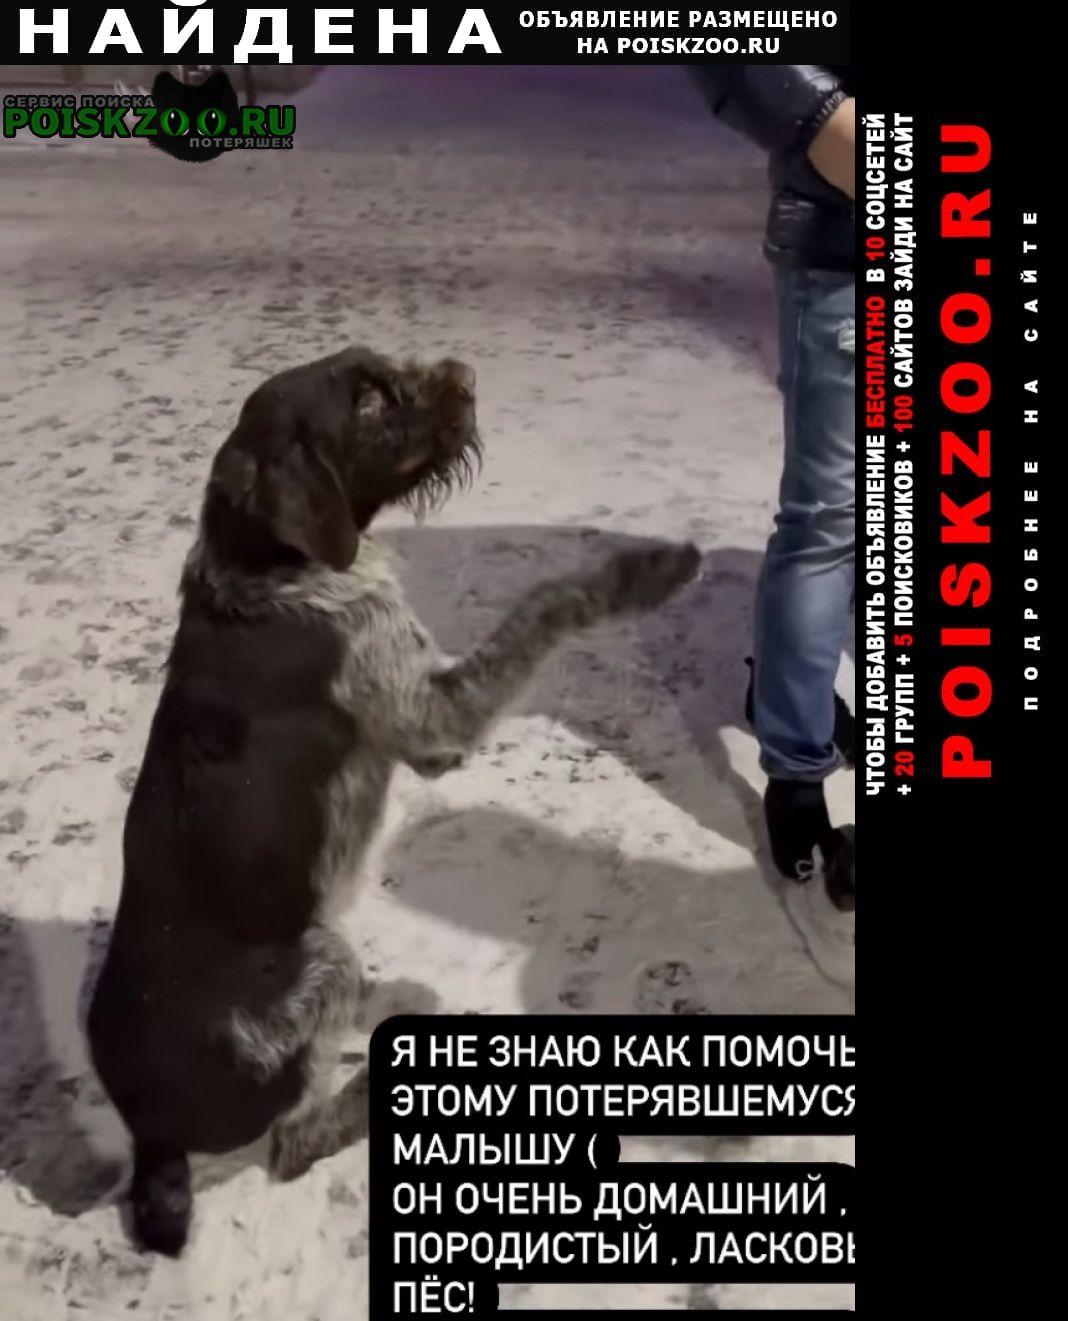 Найдена собака драат хаар Суздаль